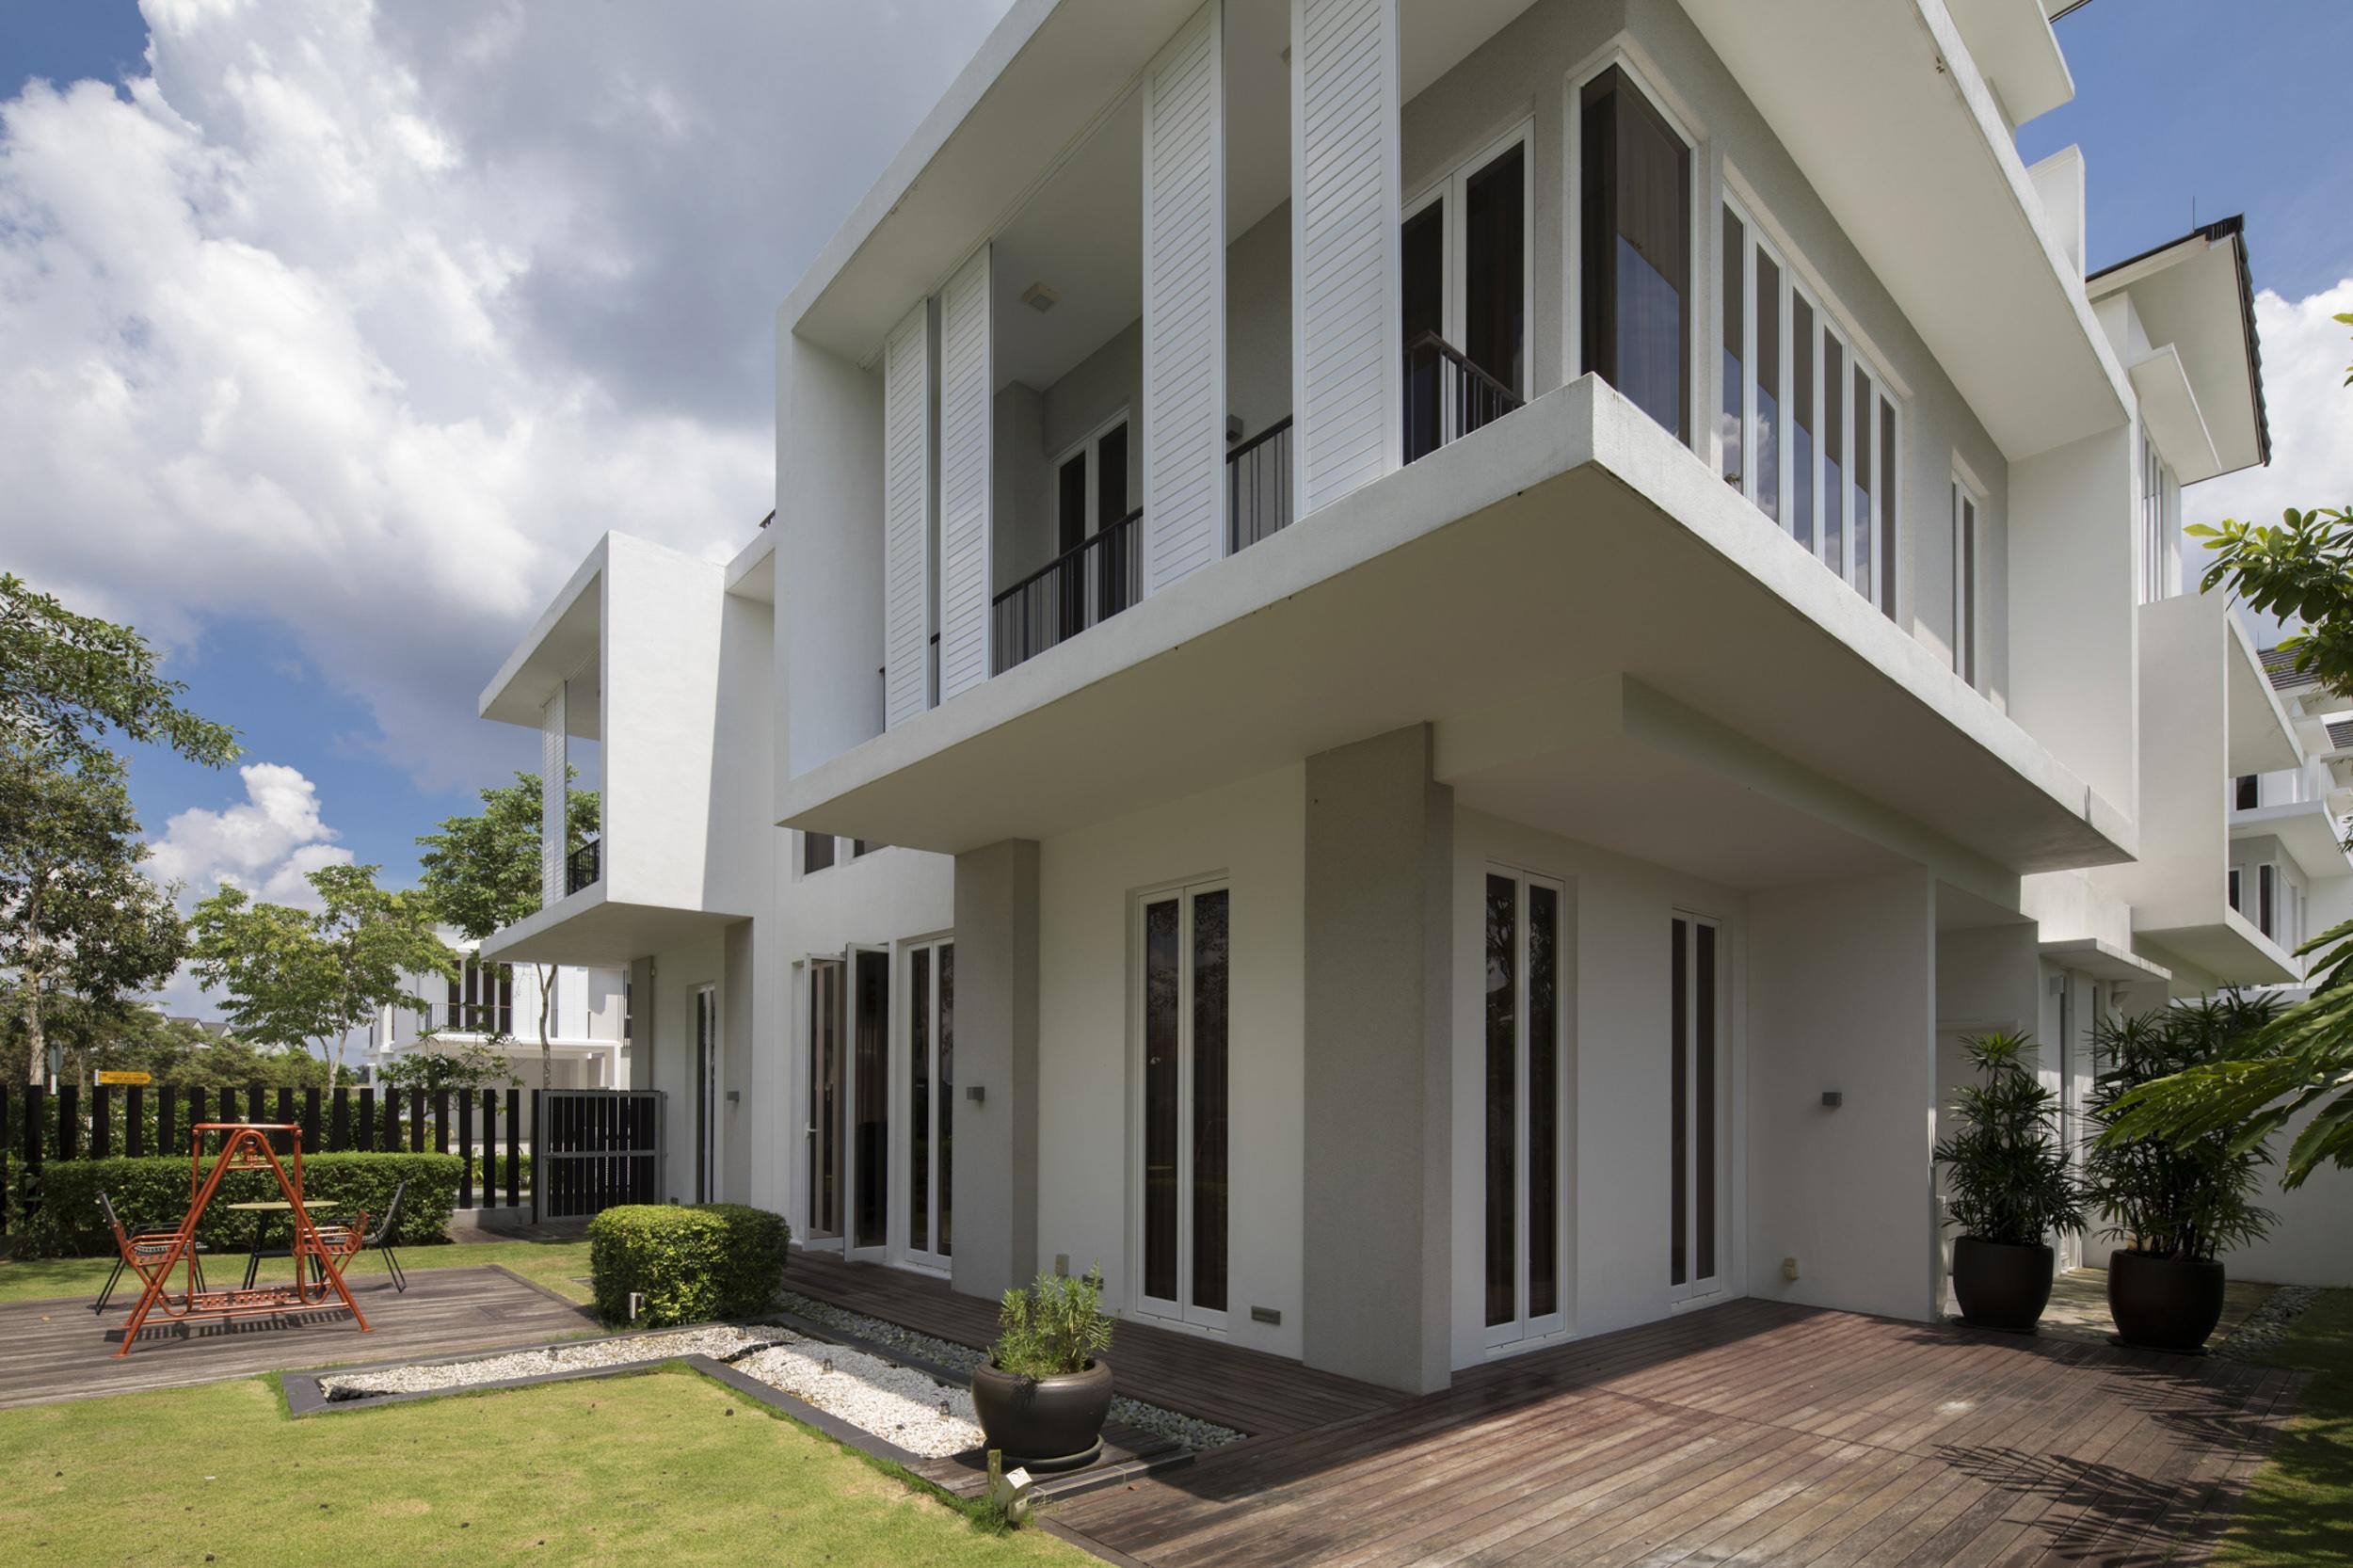 residential_architect_photographer_sydney_04.jpg